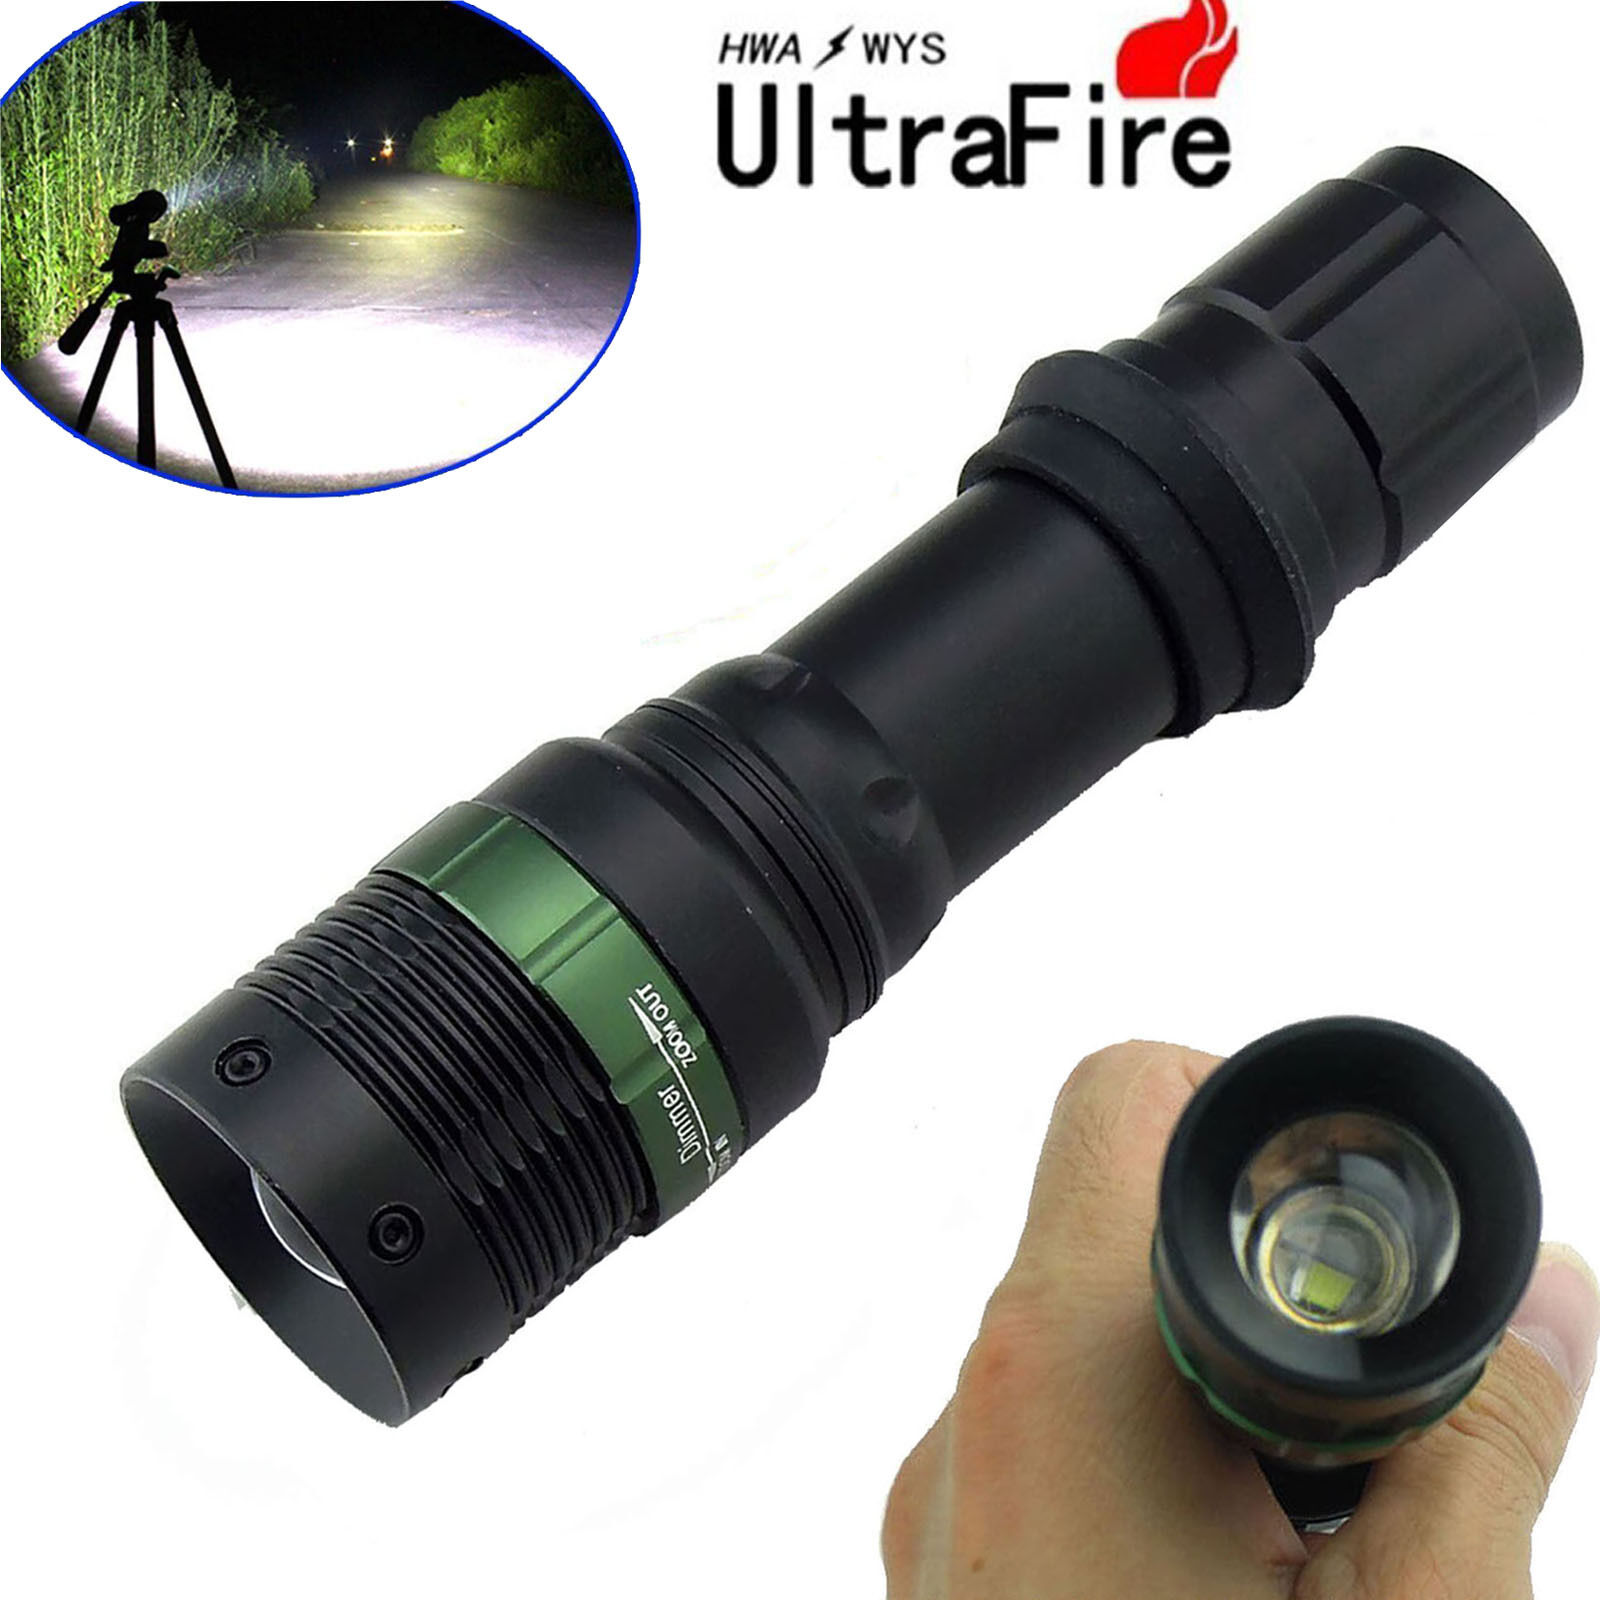 Купить Ultrafire CREE XM-L T6 Zoomable 6000 Lumen Tactical LED Flashlight Torch Lamp